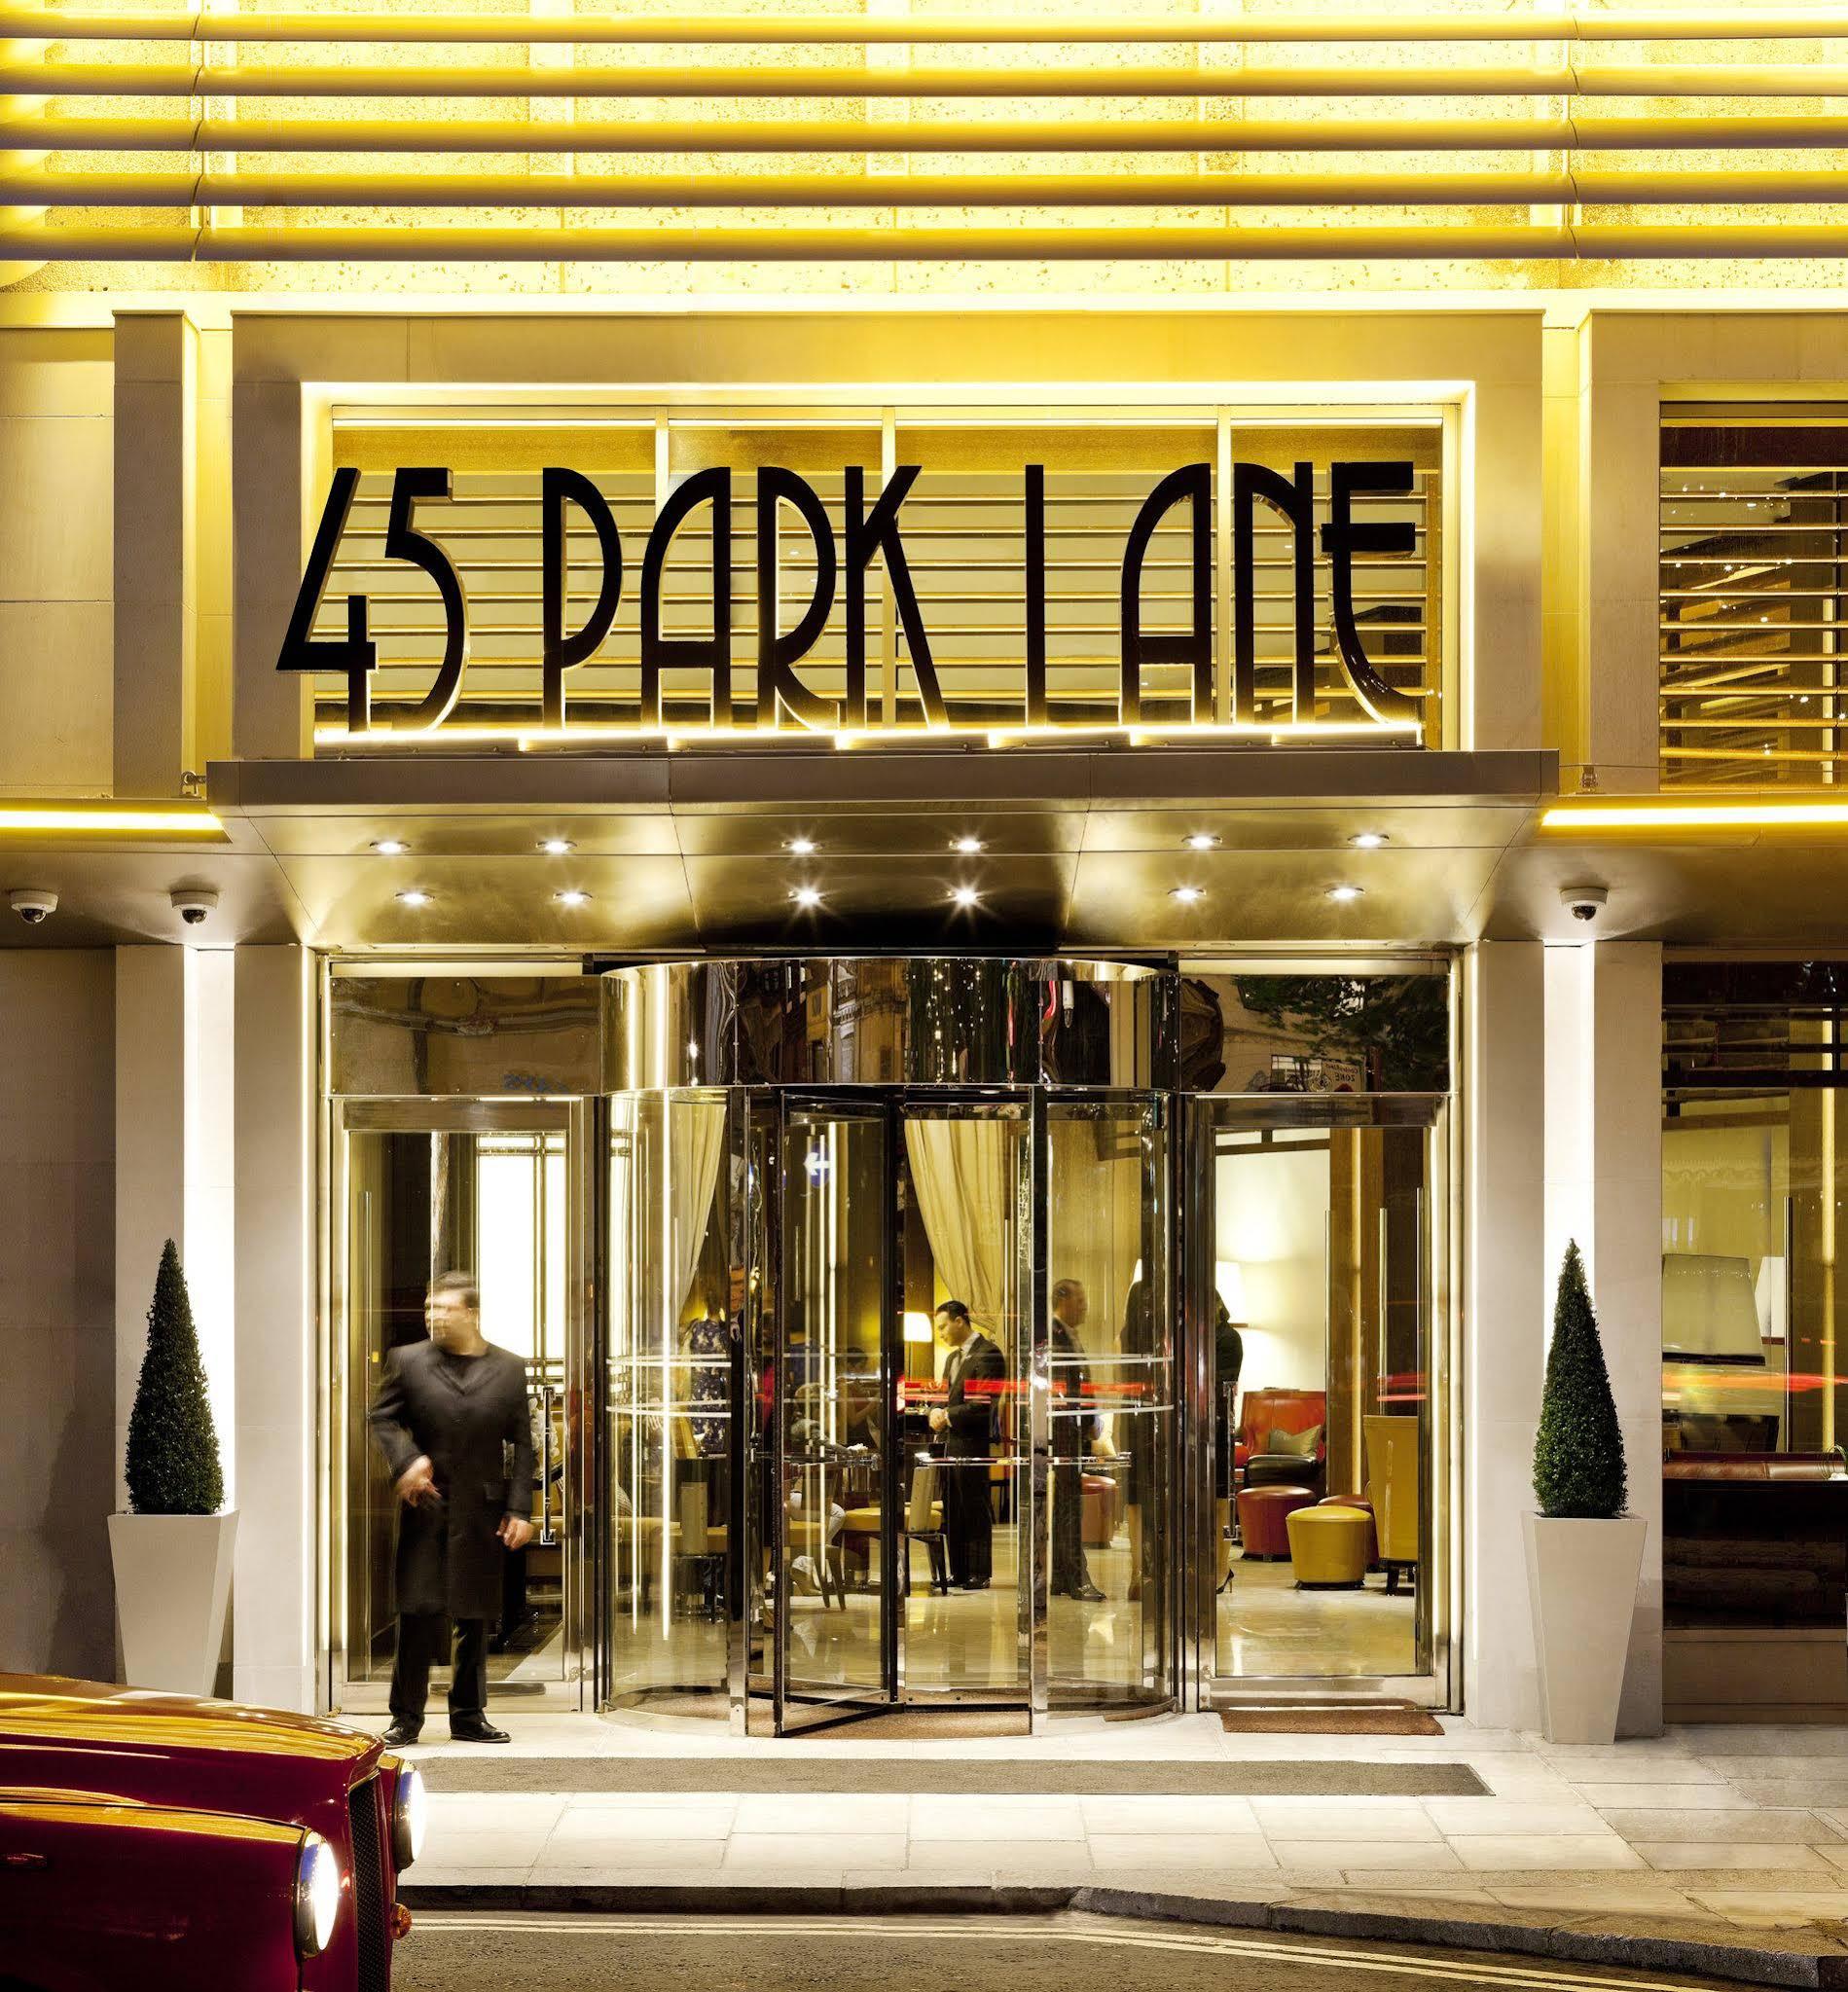 45 Park Lane